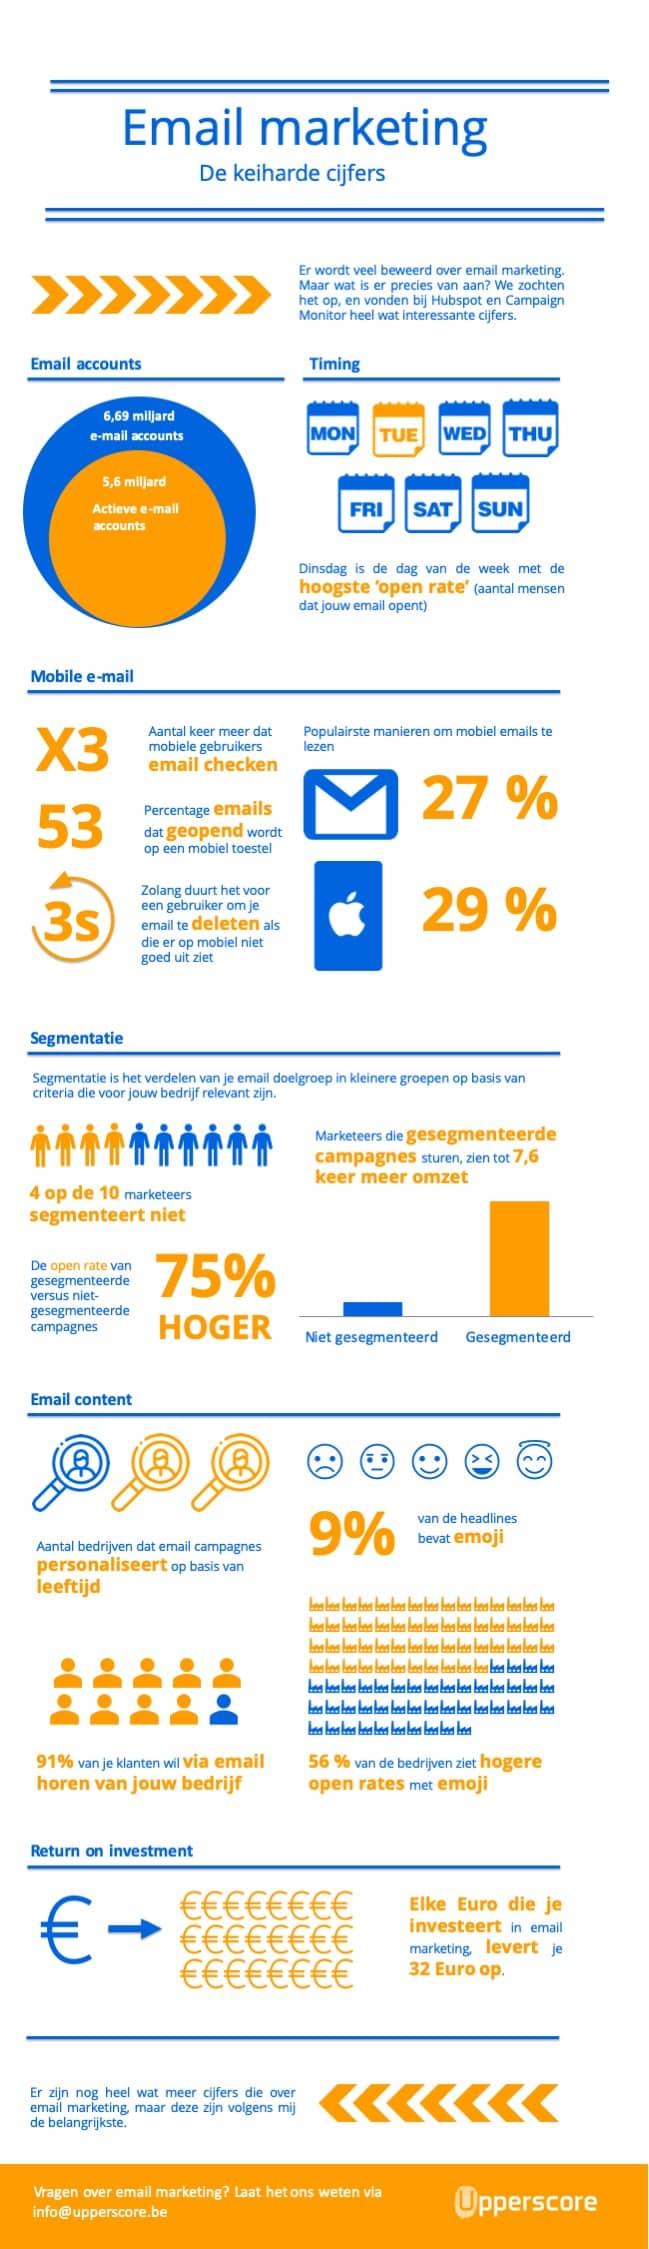 Infographic Email marketing statistieken - Upperscore